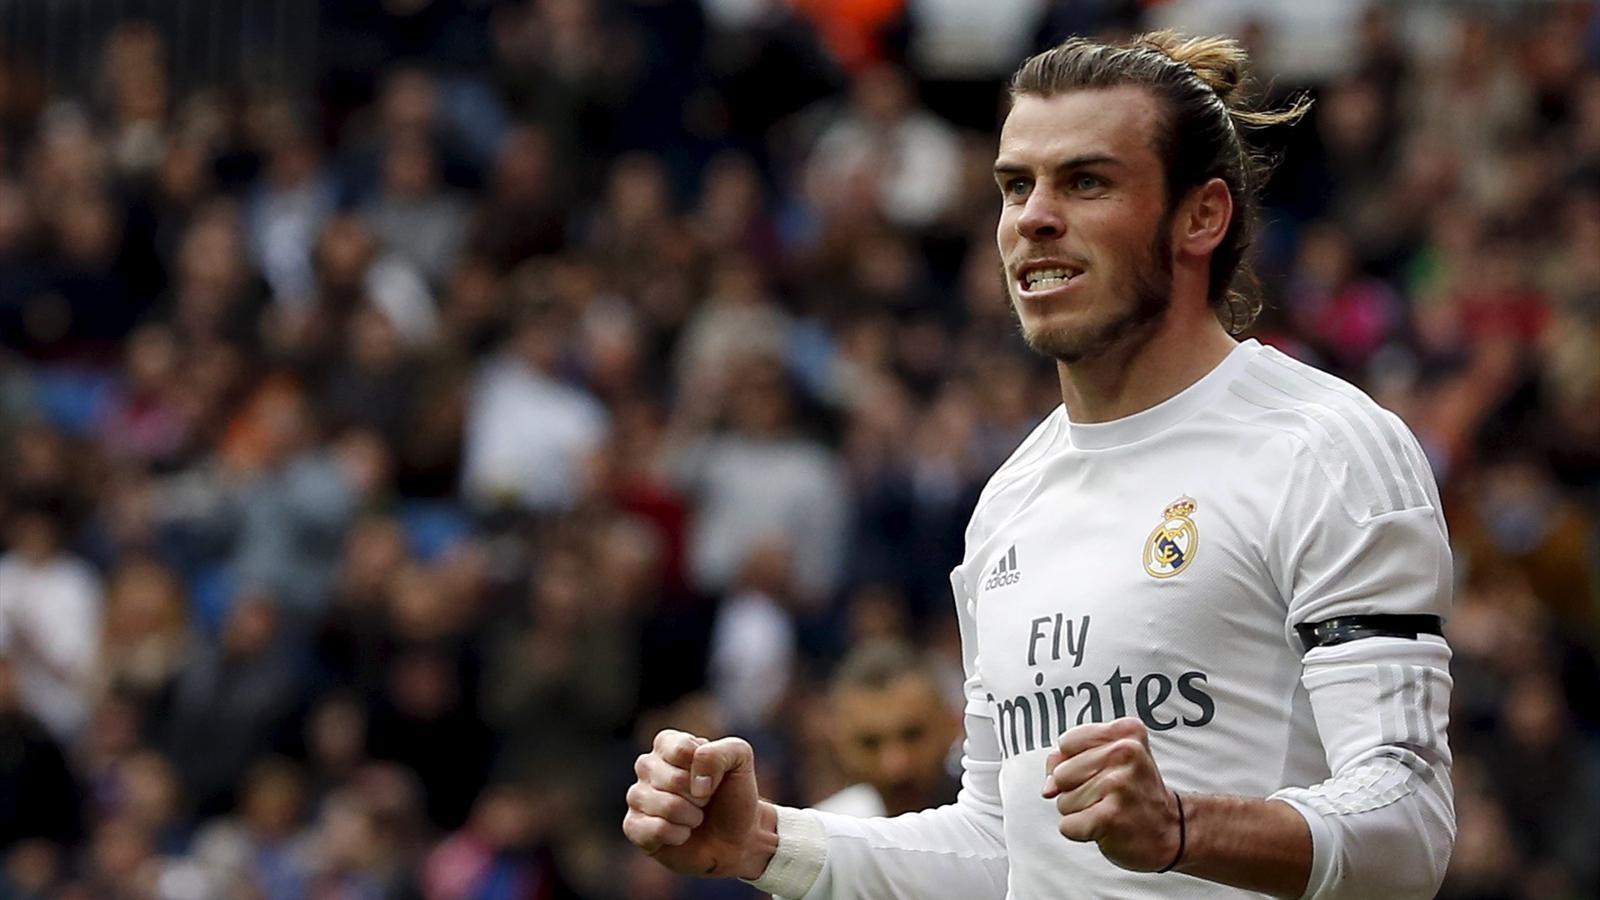 Real Madrid's Gareth Bale celebrates v Rayo Vallecano